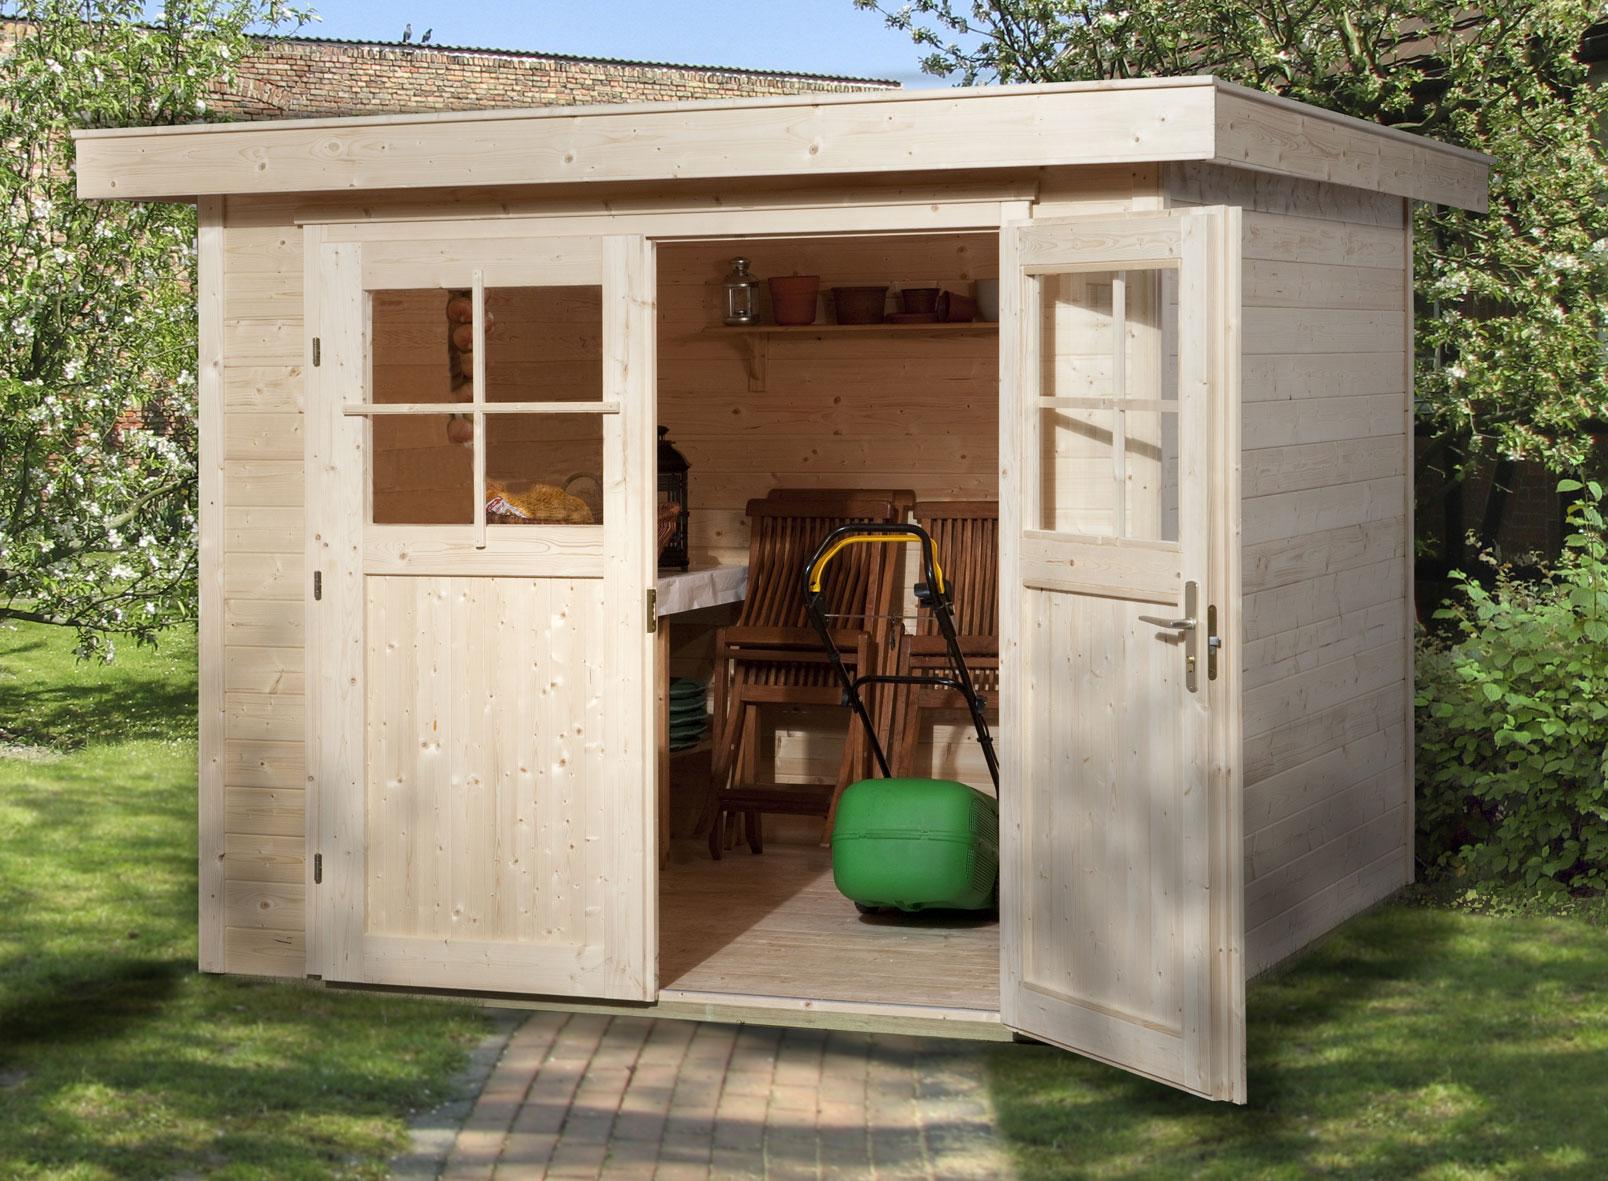 weka ger tehaus 21 mm gartenhaus 227 gr 1 natur 225x249cm bild 1. Black Bedroom Furniture Sets. Home Design Ideas